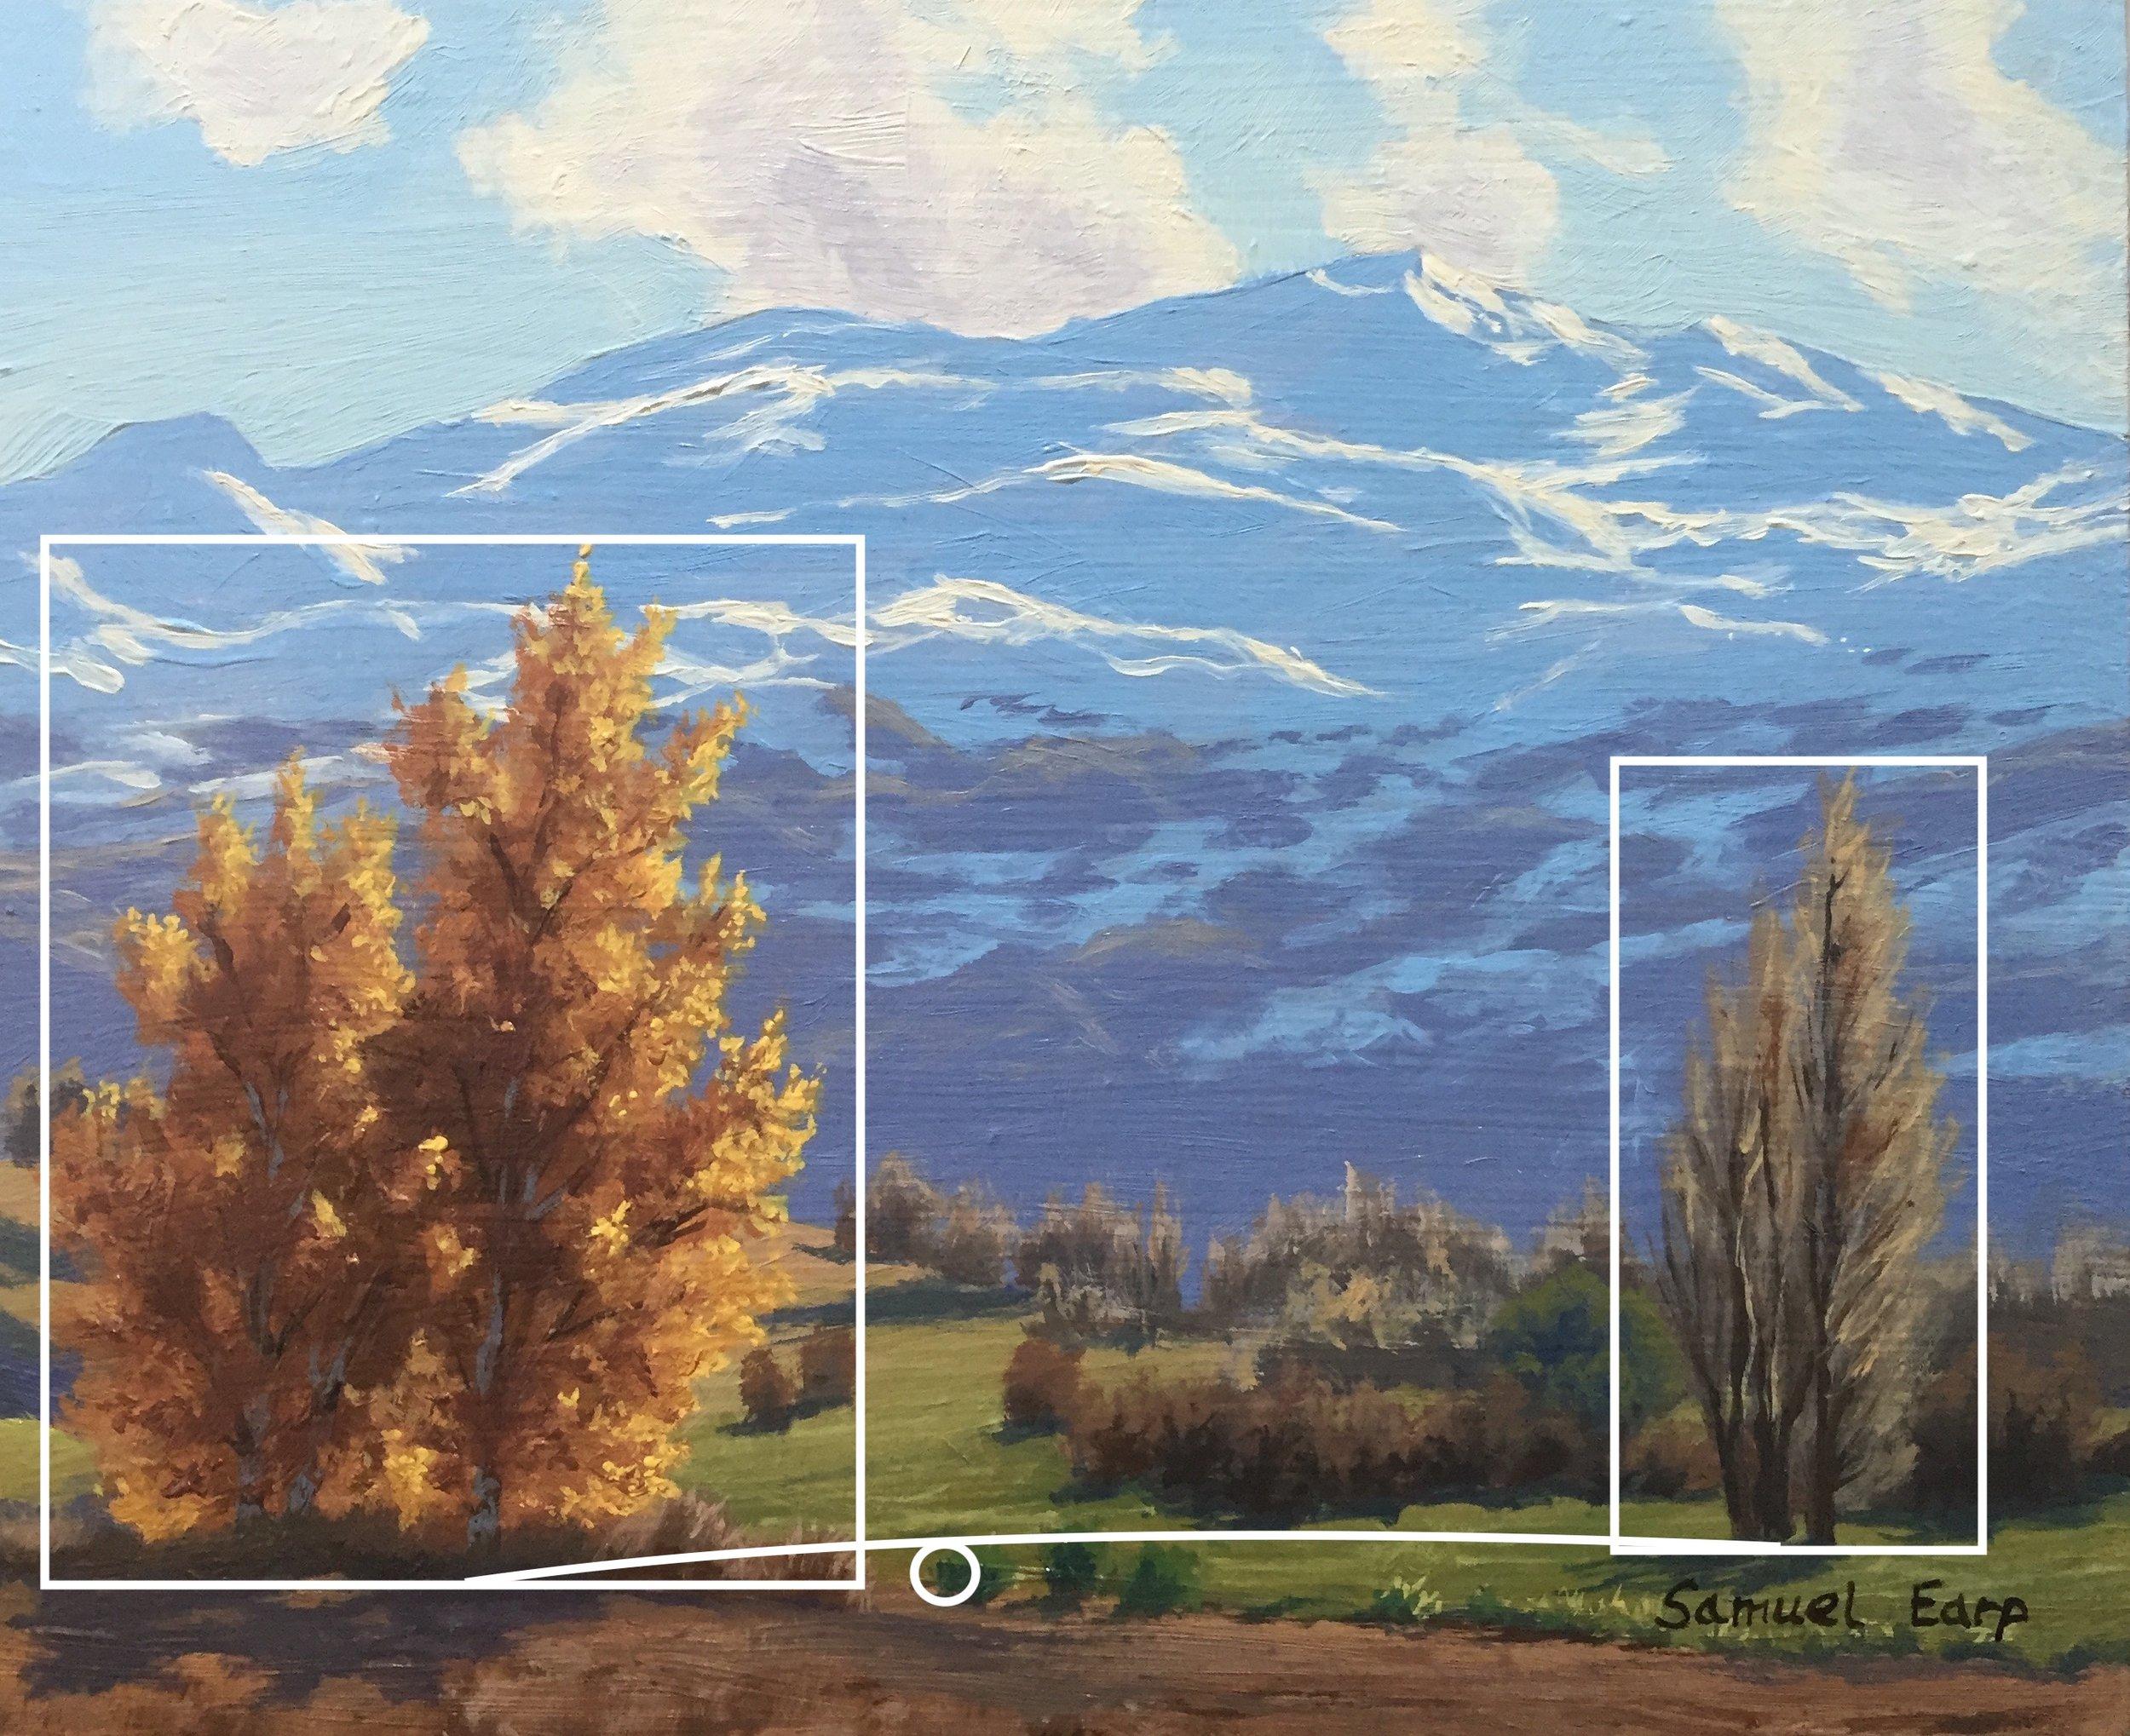 Steelyard composition - Coronet Peak - Autumn - Queenstown - landscapes - oil painting - Samuel Earp copy.jpg